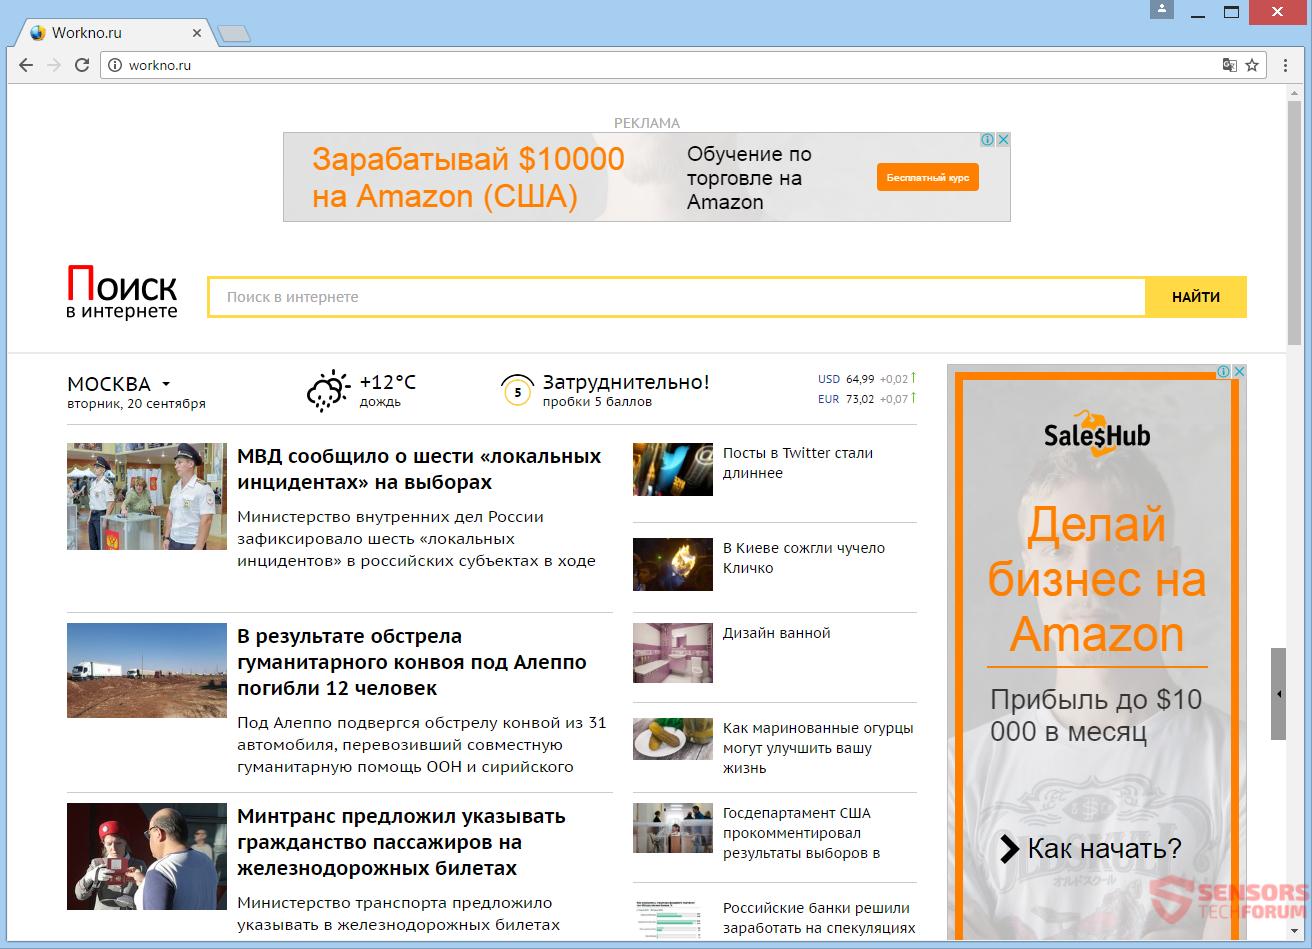 STF-workno-ru-work-no-browser-kaper-redirect-main-plaats-pagina